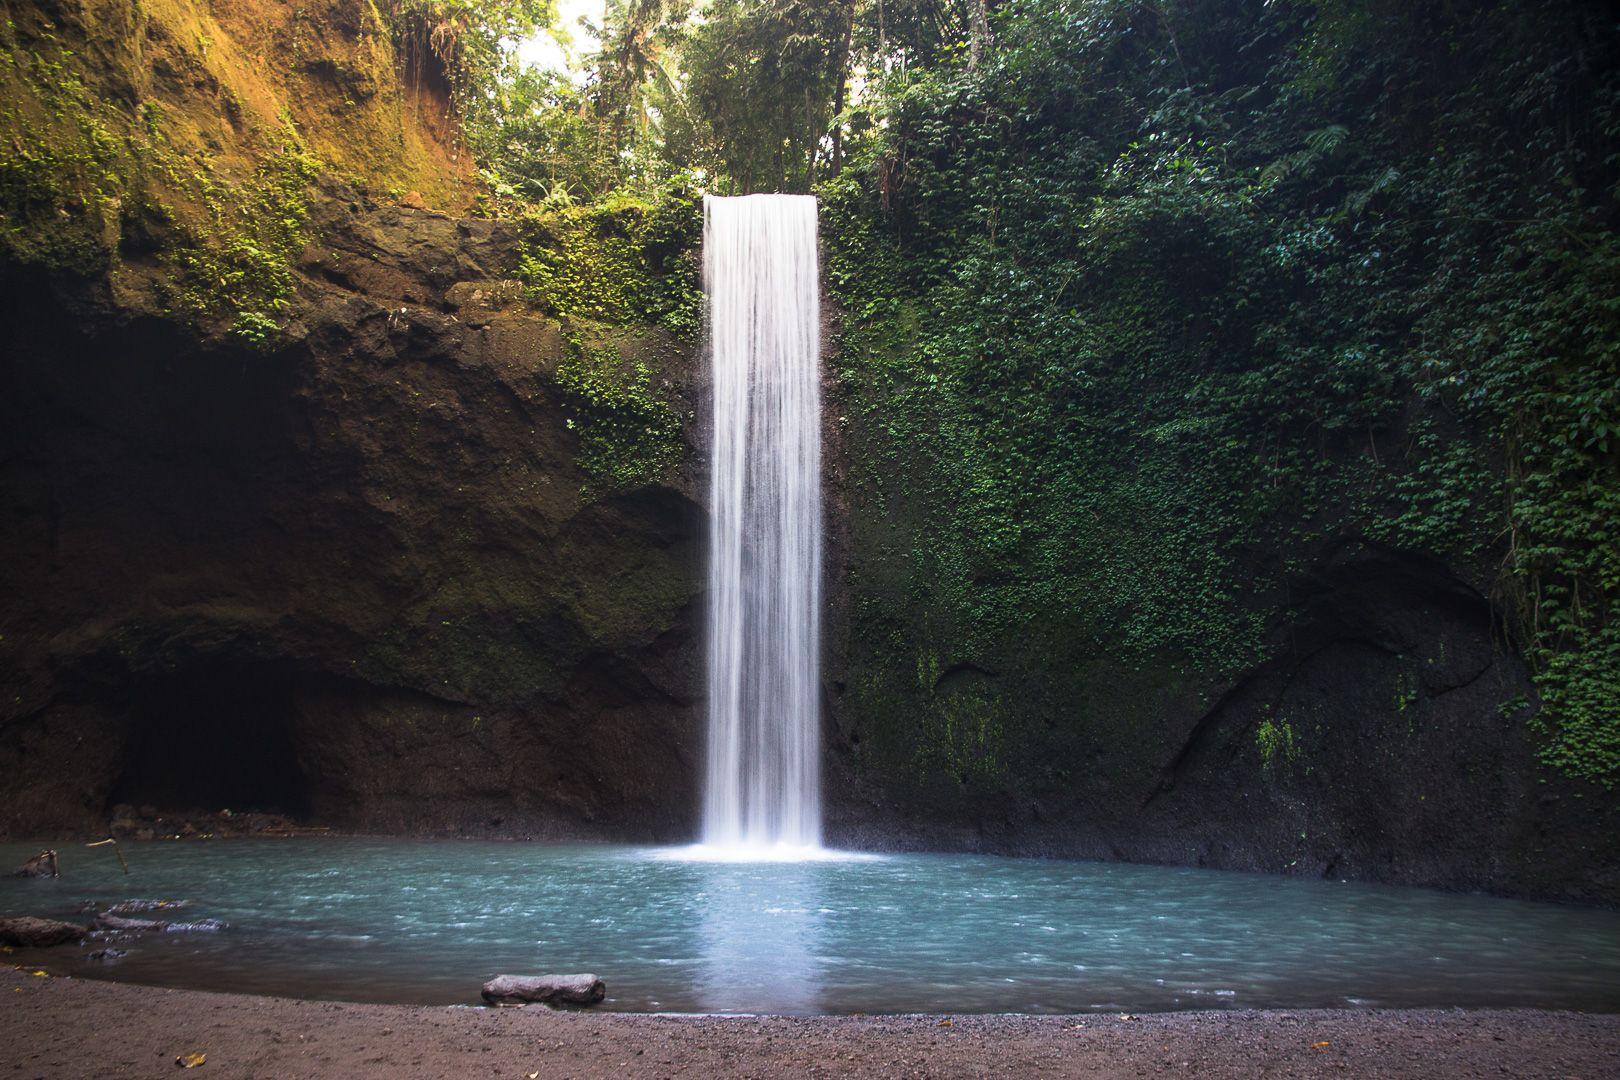 Waterfall balinorth слова поддержки в работе девушке